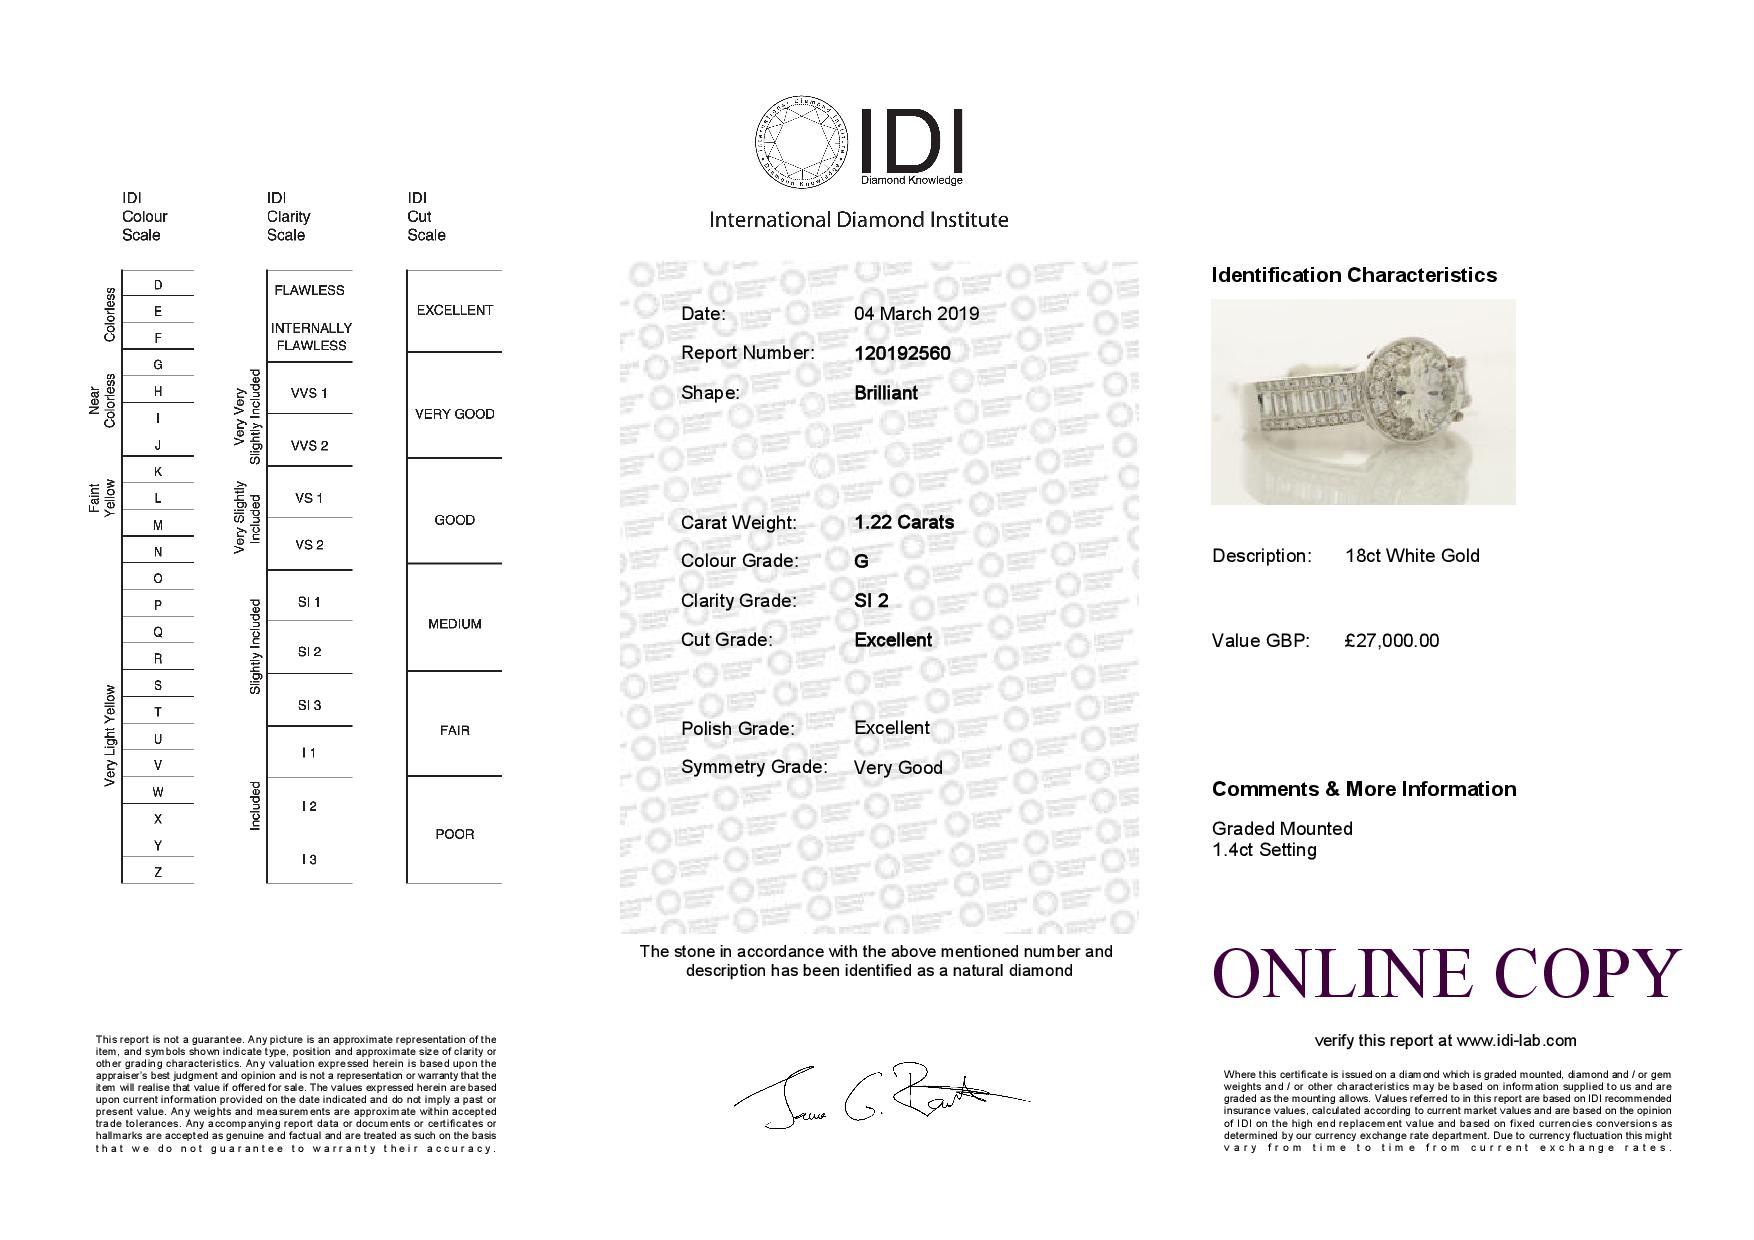 18k White Gold Single Stone With Halo Setting Ring 2.62 - Image 4 of 4